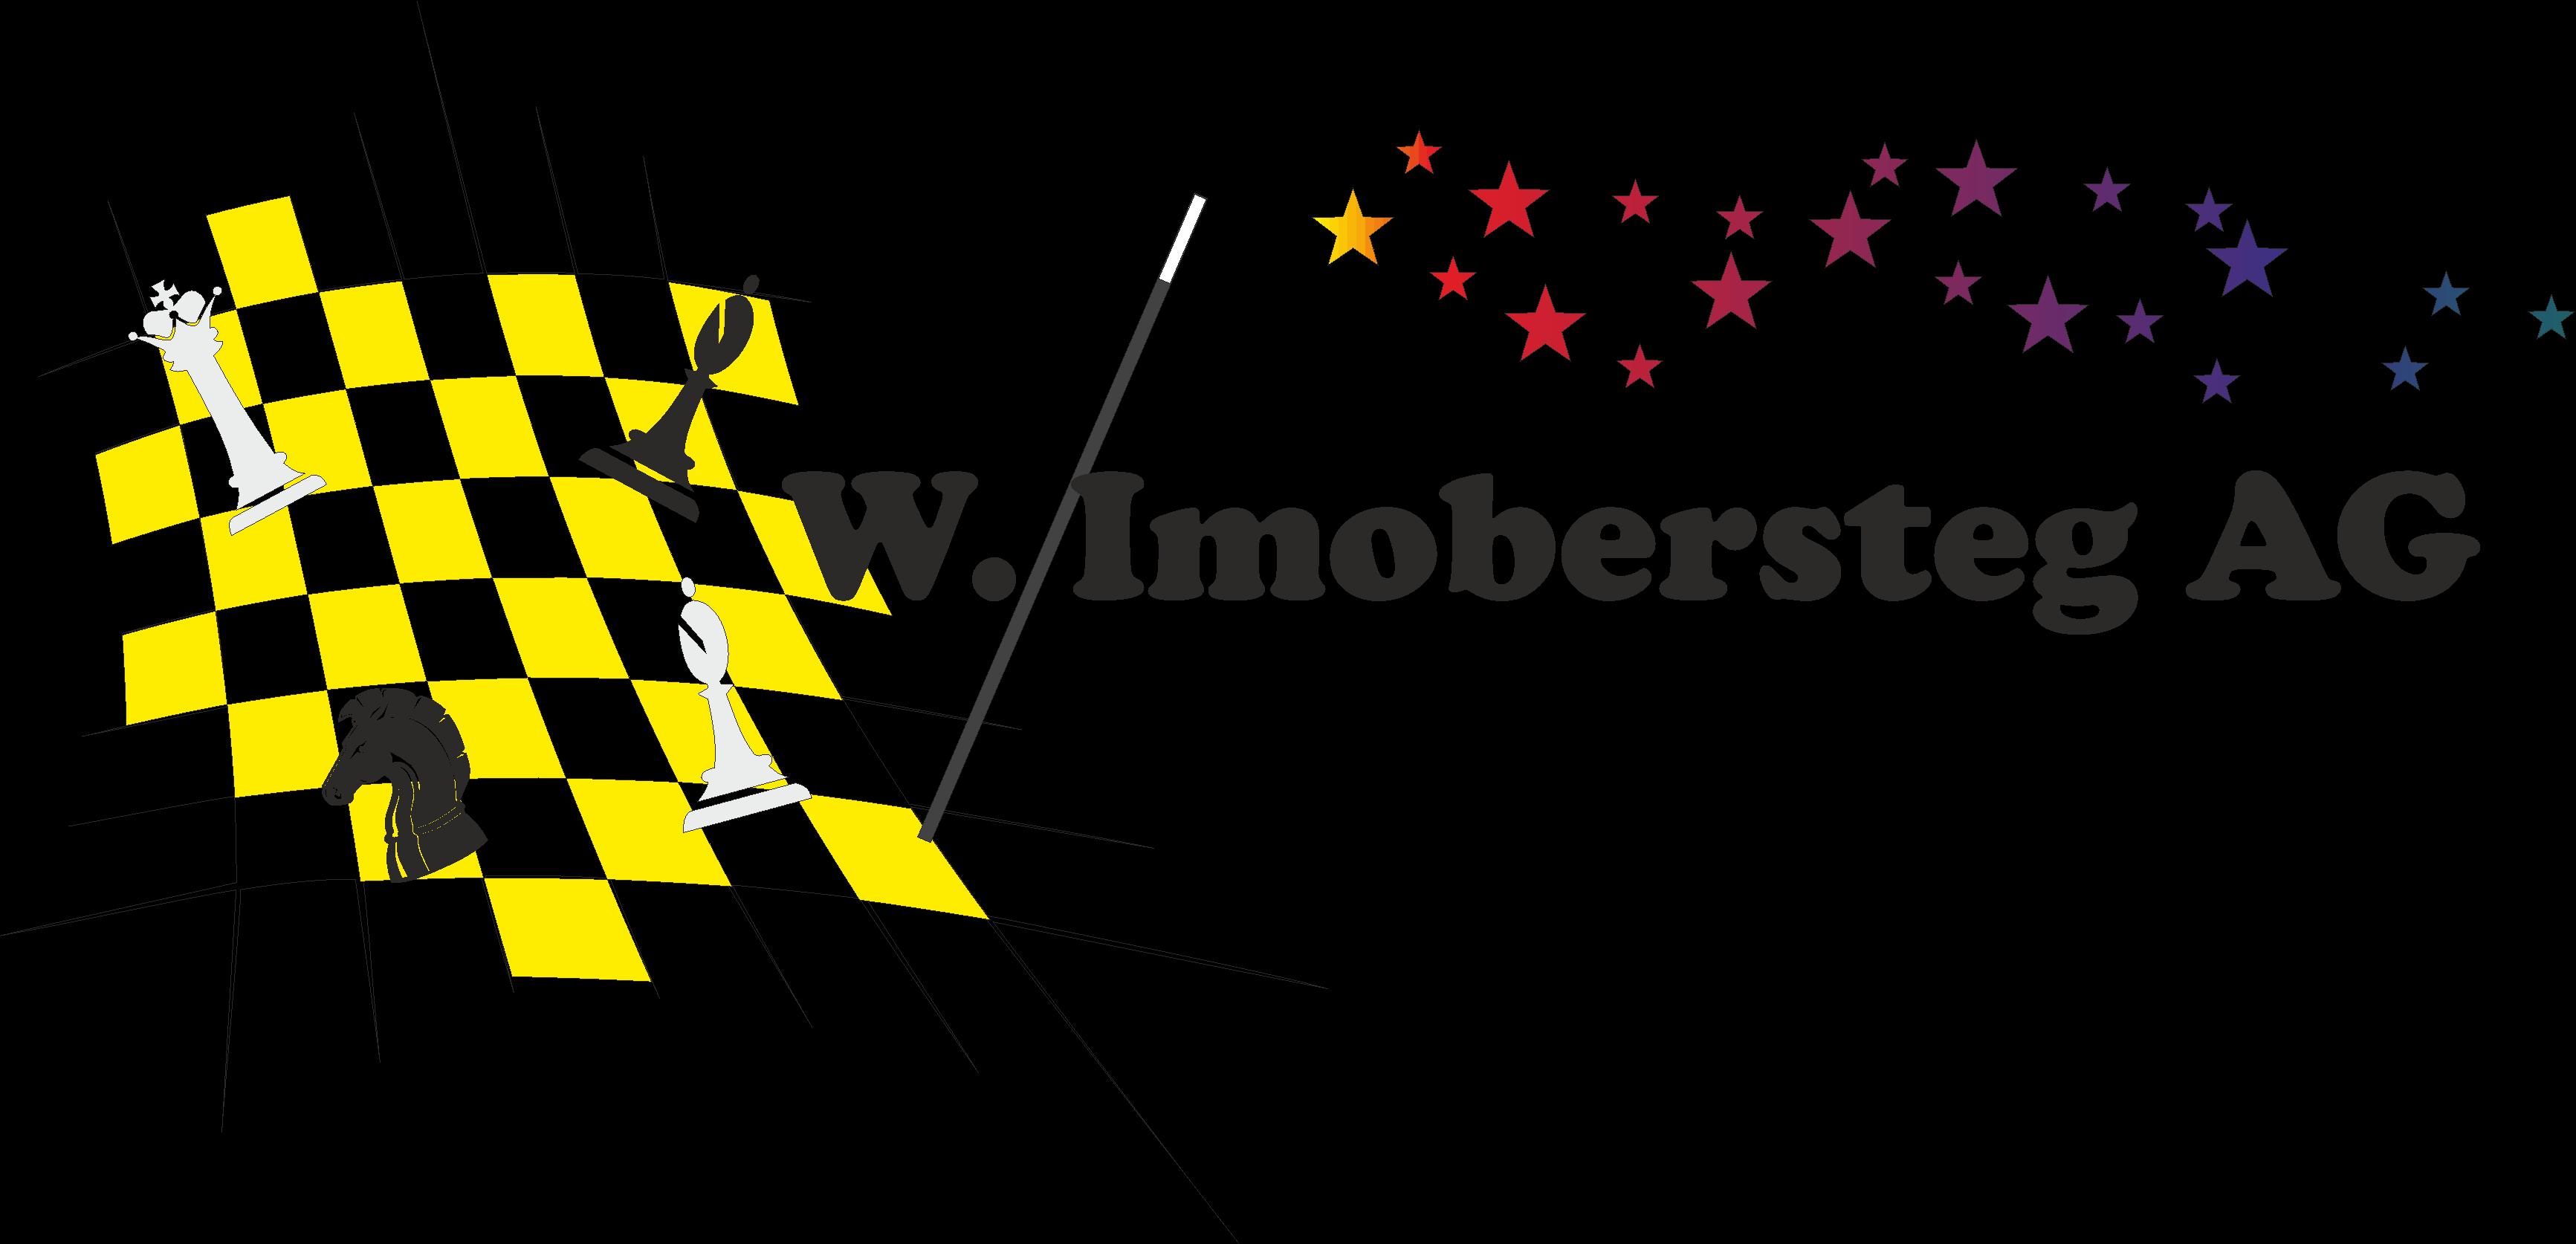 W. Imobersteg AG